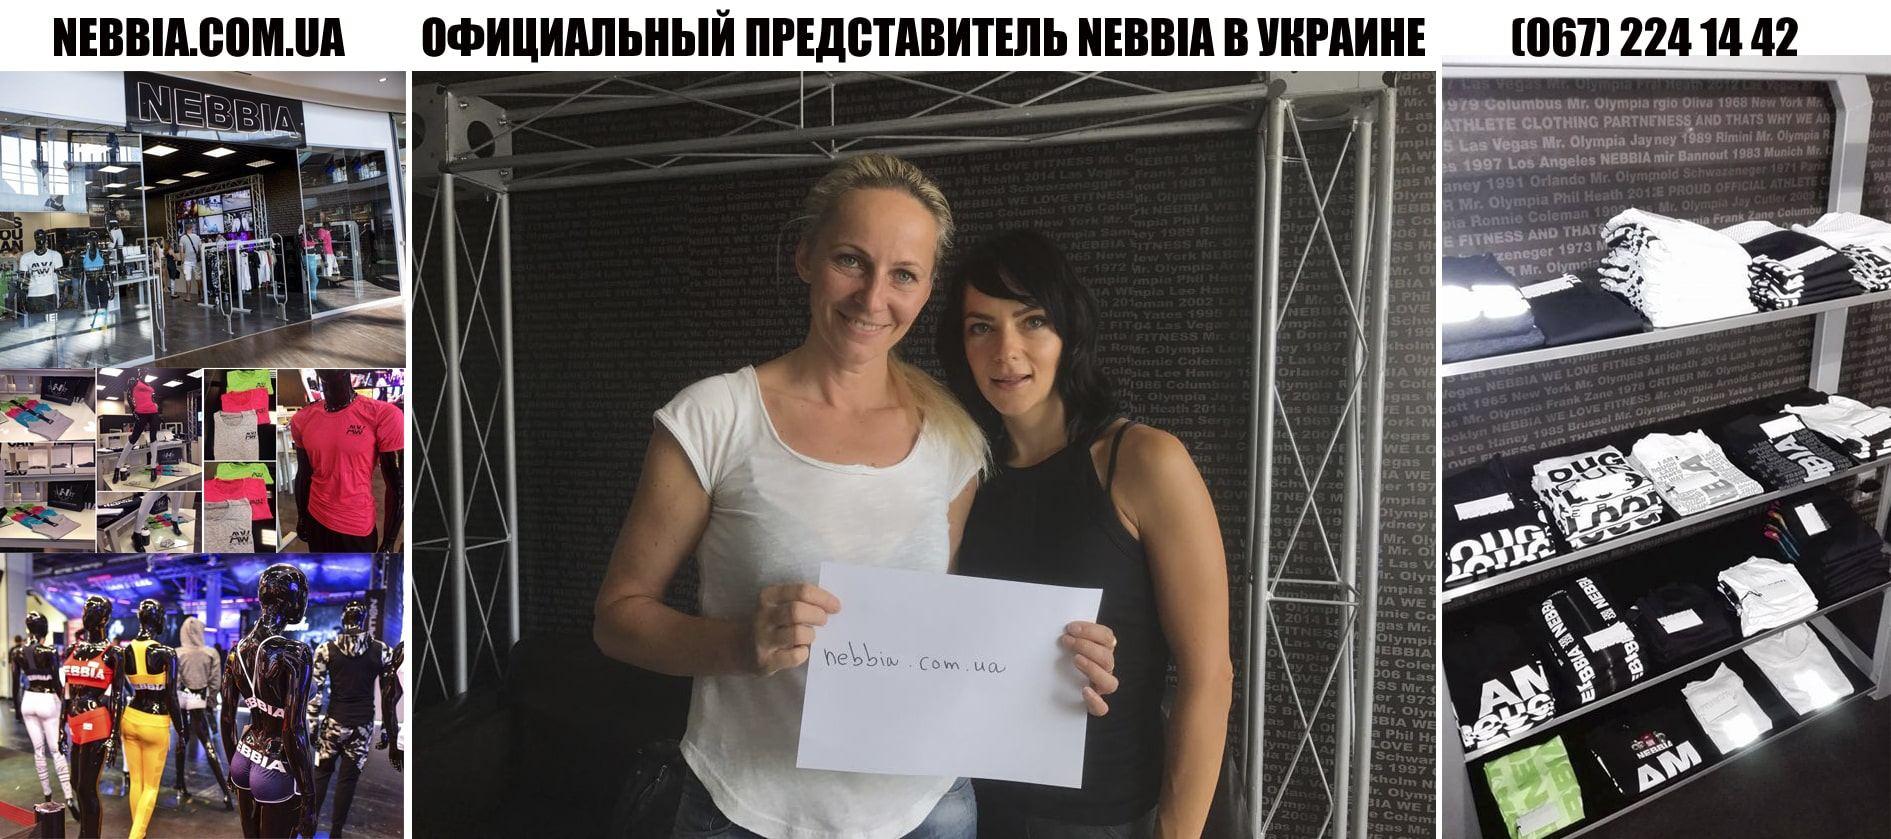 представитель NEBBIA в Украине 0672241442